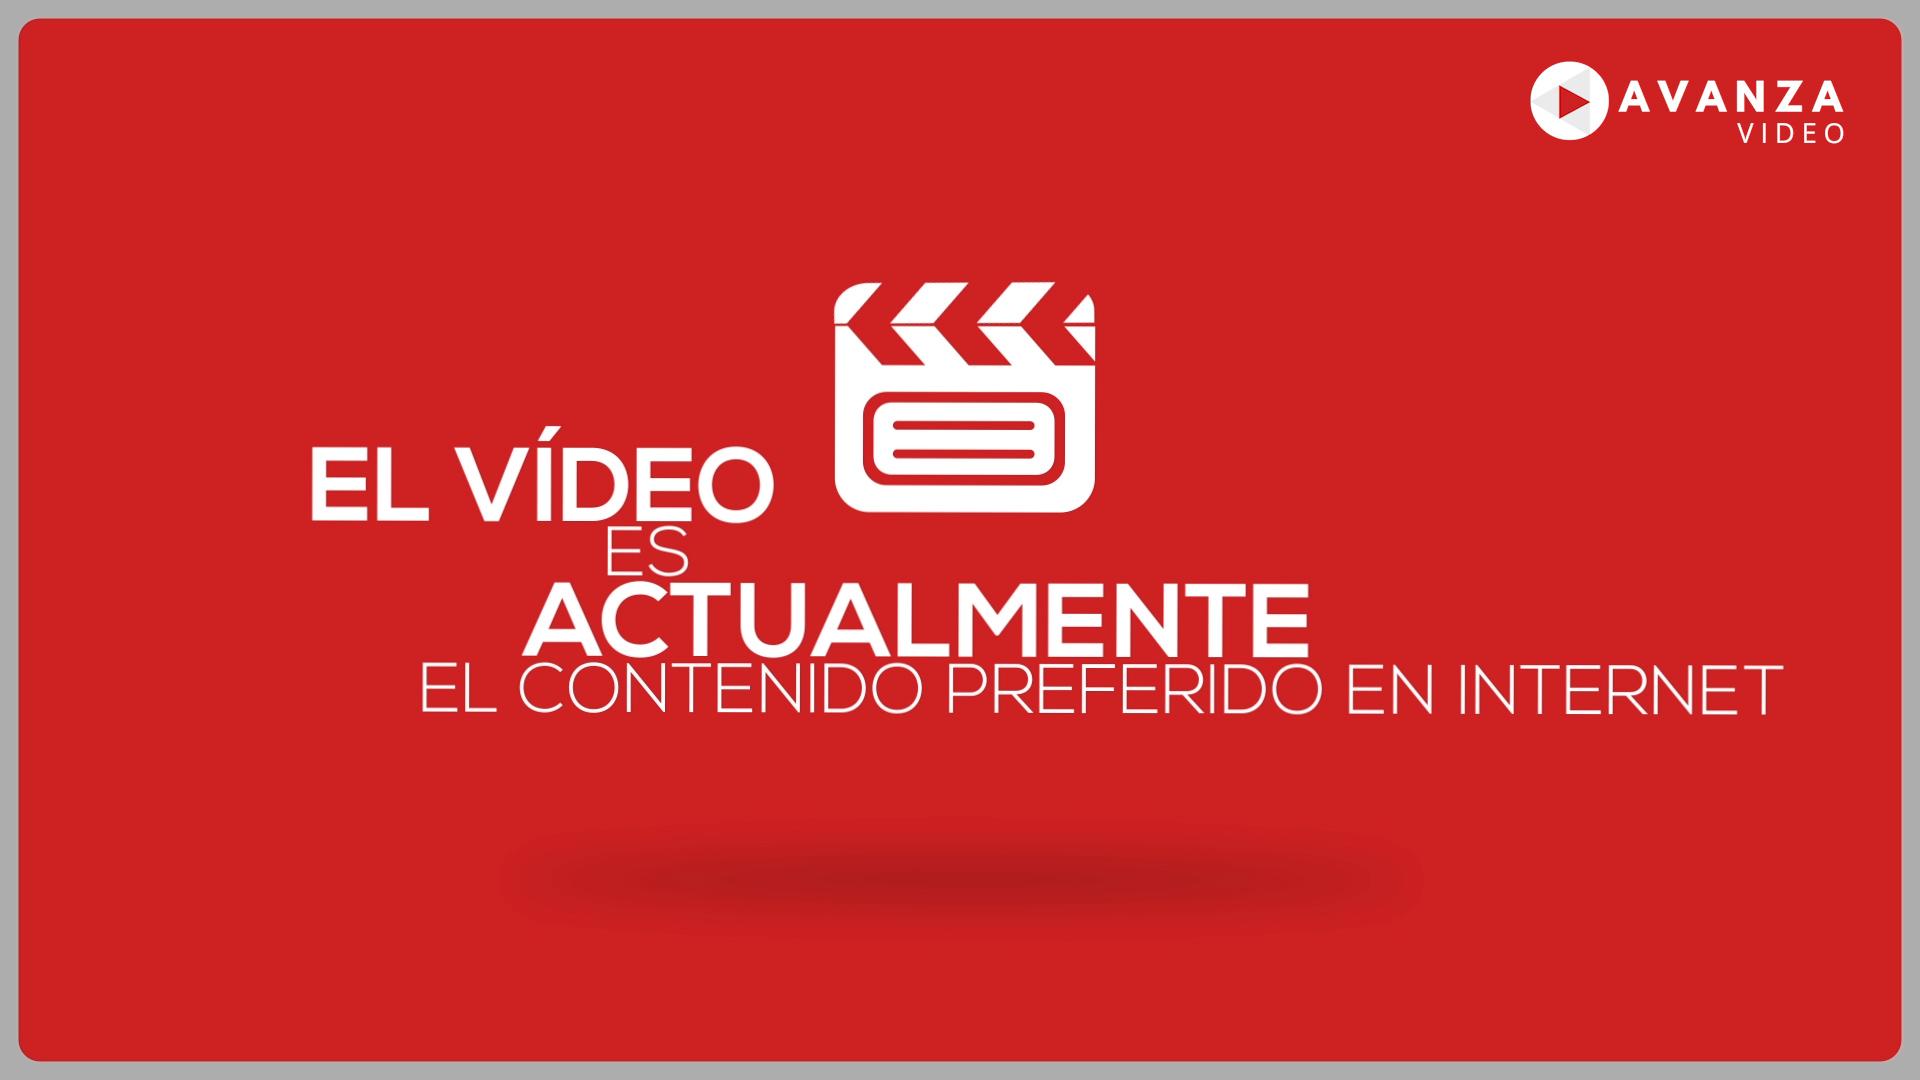 El vídeo: la estrella del marketing digital